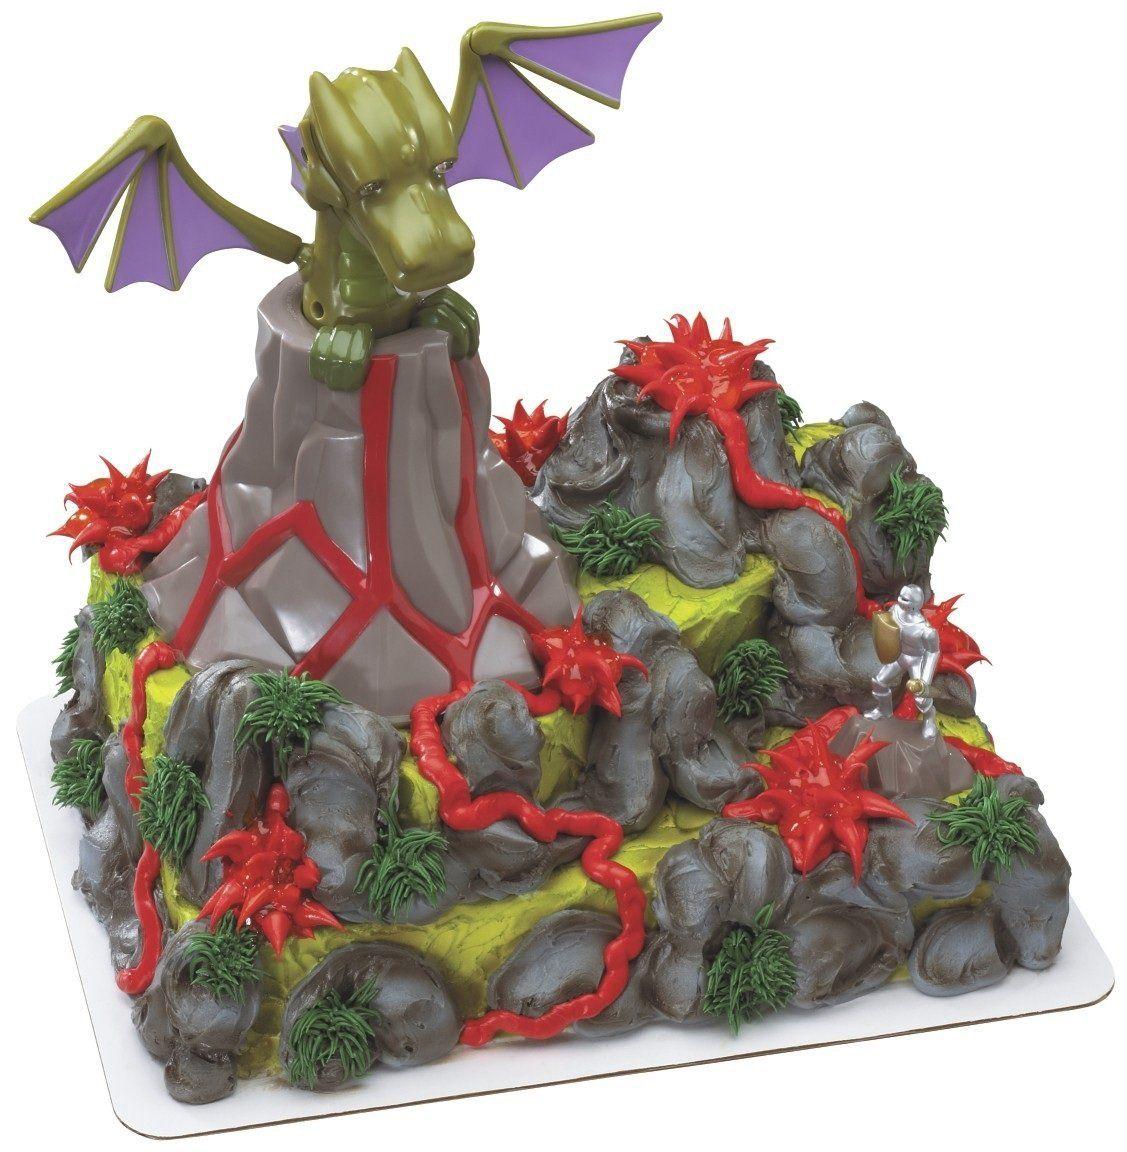 Dragon adventure signature decoset cake decoration